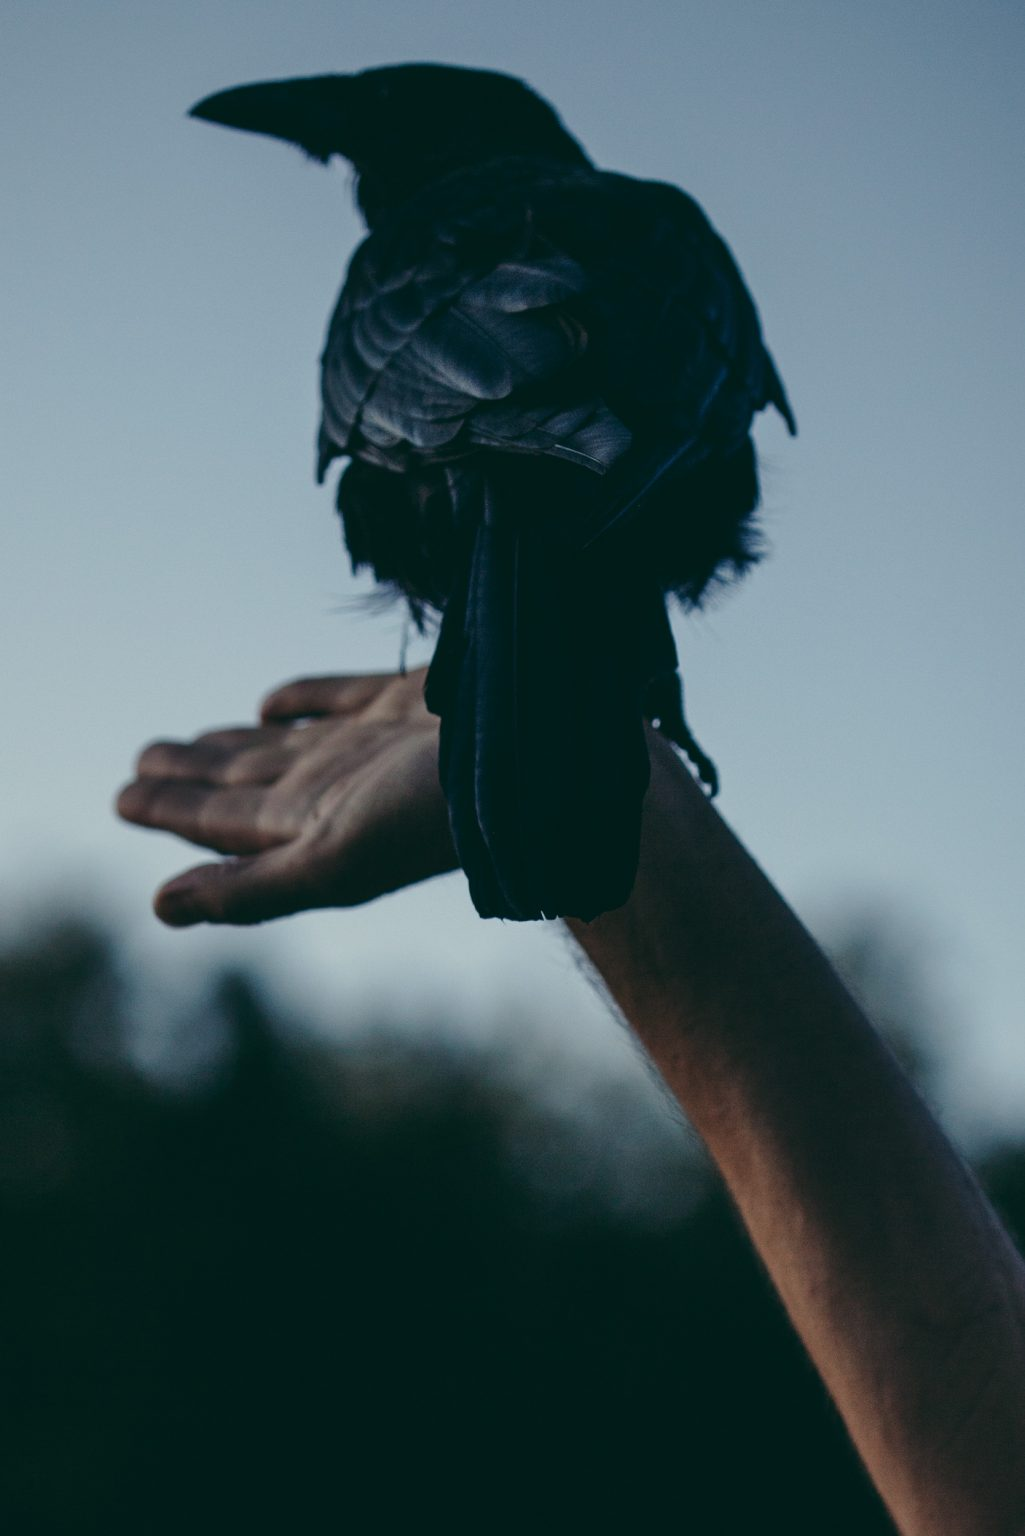 Valdivienne, France, August 2019 - At sunset, in the field behind the new house, the crow Bayo plays with Tristan. ><  Valdivienne, Francia, agosto 2019 - Al tramonto, nel campo dietro la nuova casa, la cornacchia Bayo gioca con Tristan Plot.*** SPECIAL   FEE   APPLIES *** *** Local Caption *** 01489355